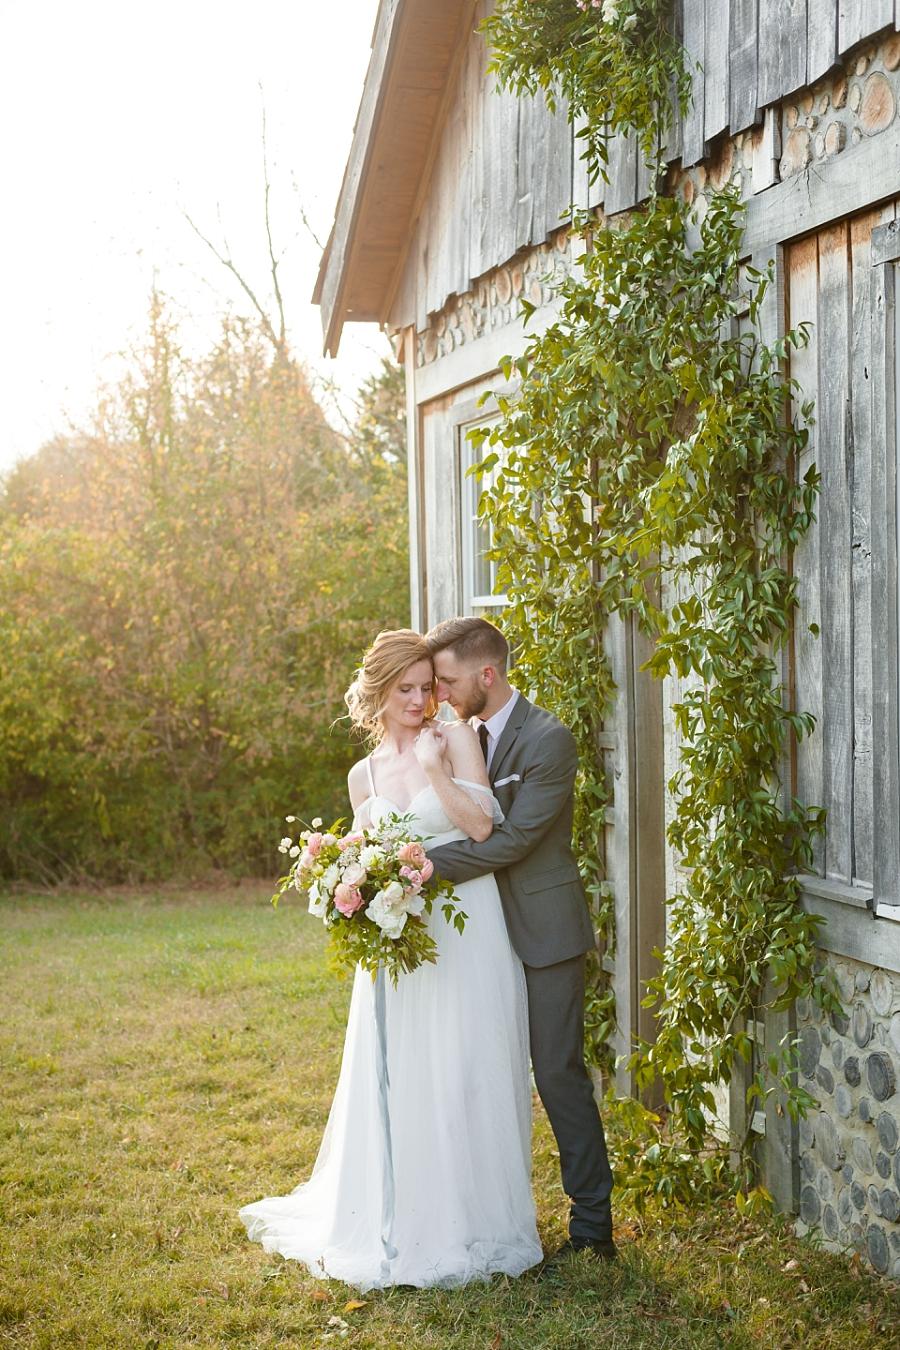 Stacy-Anderson-Photography-Nashville-Houston-Destination-Wedding-Photographer_0025-1.jpg